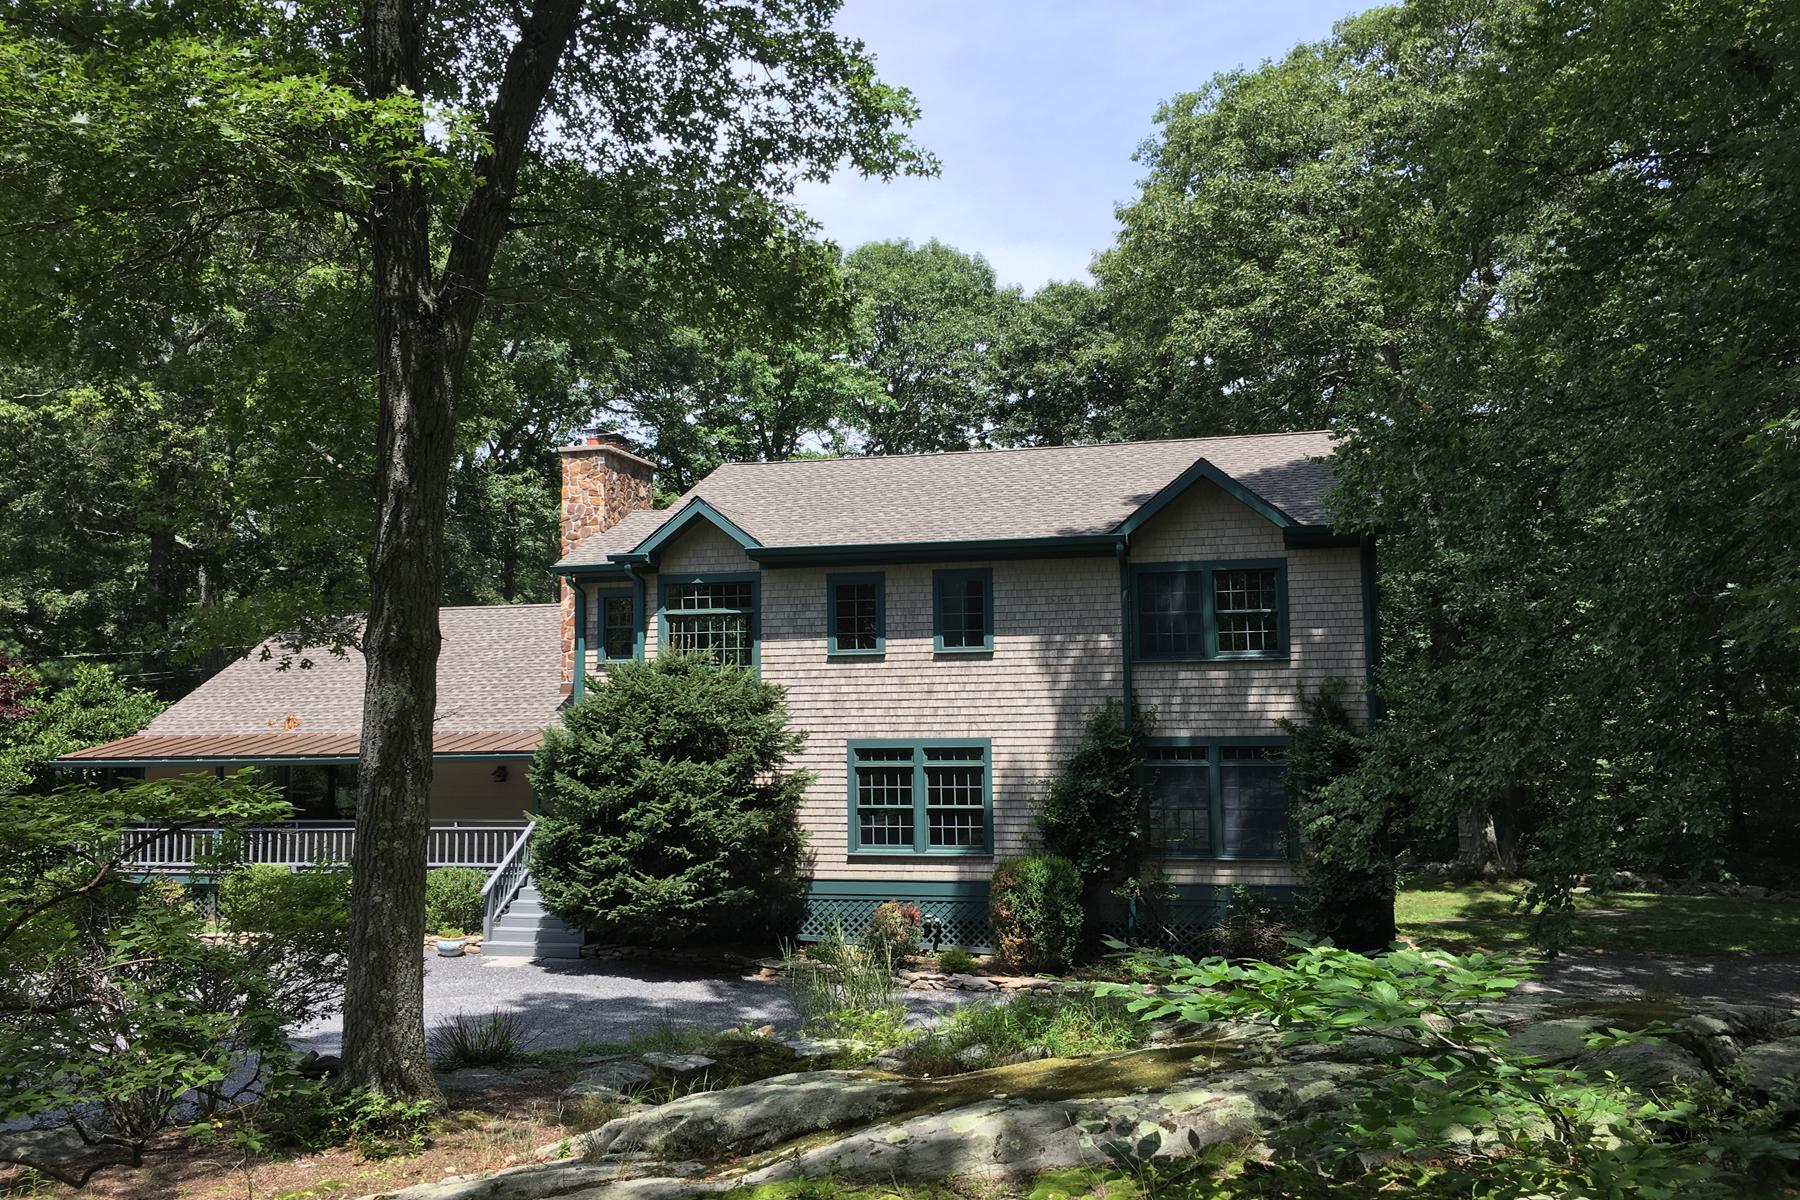 Casa Unifamiliar por un Venta en Country Farmhouse 11 Kinnicut Road East Pound Ridge, Nueva York 10576 Estados Unidos